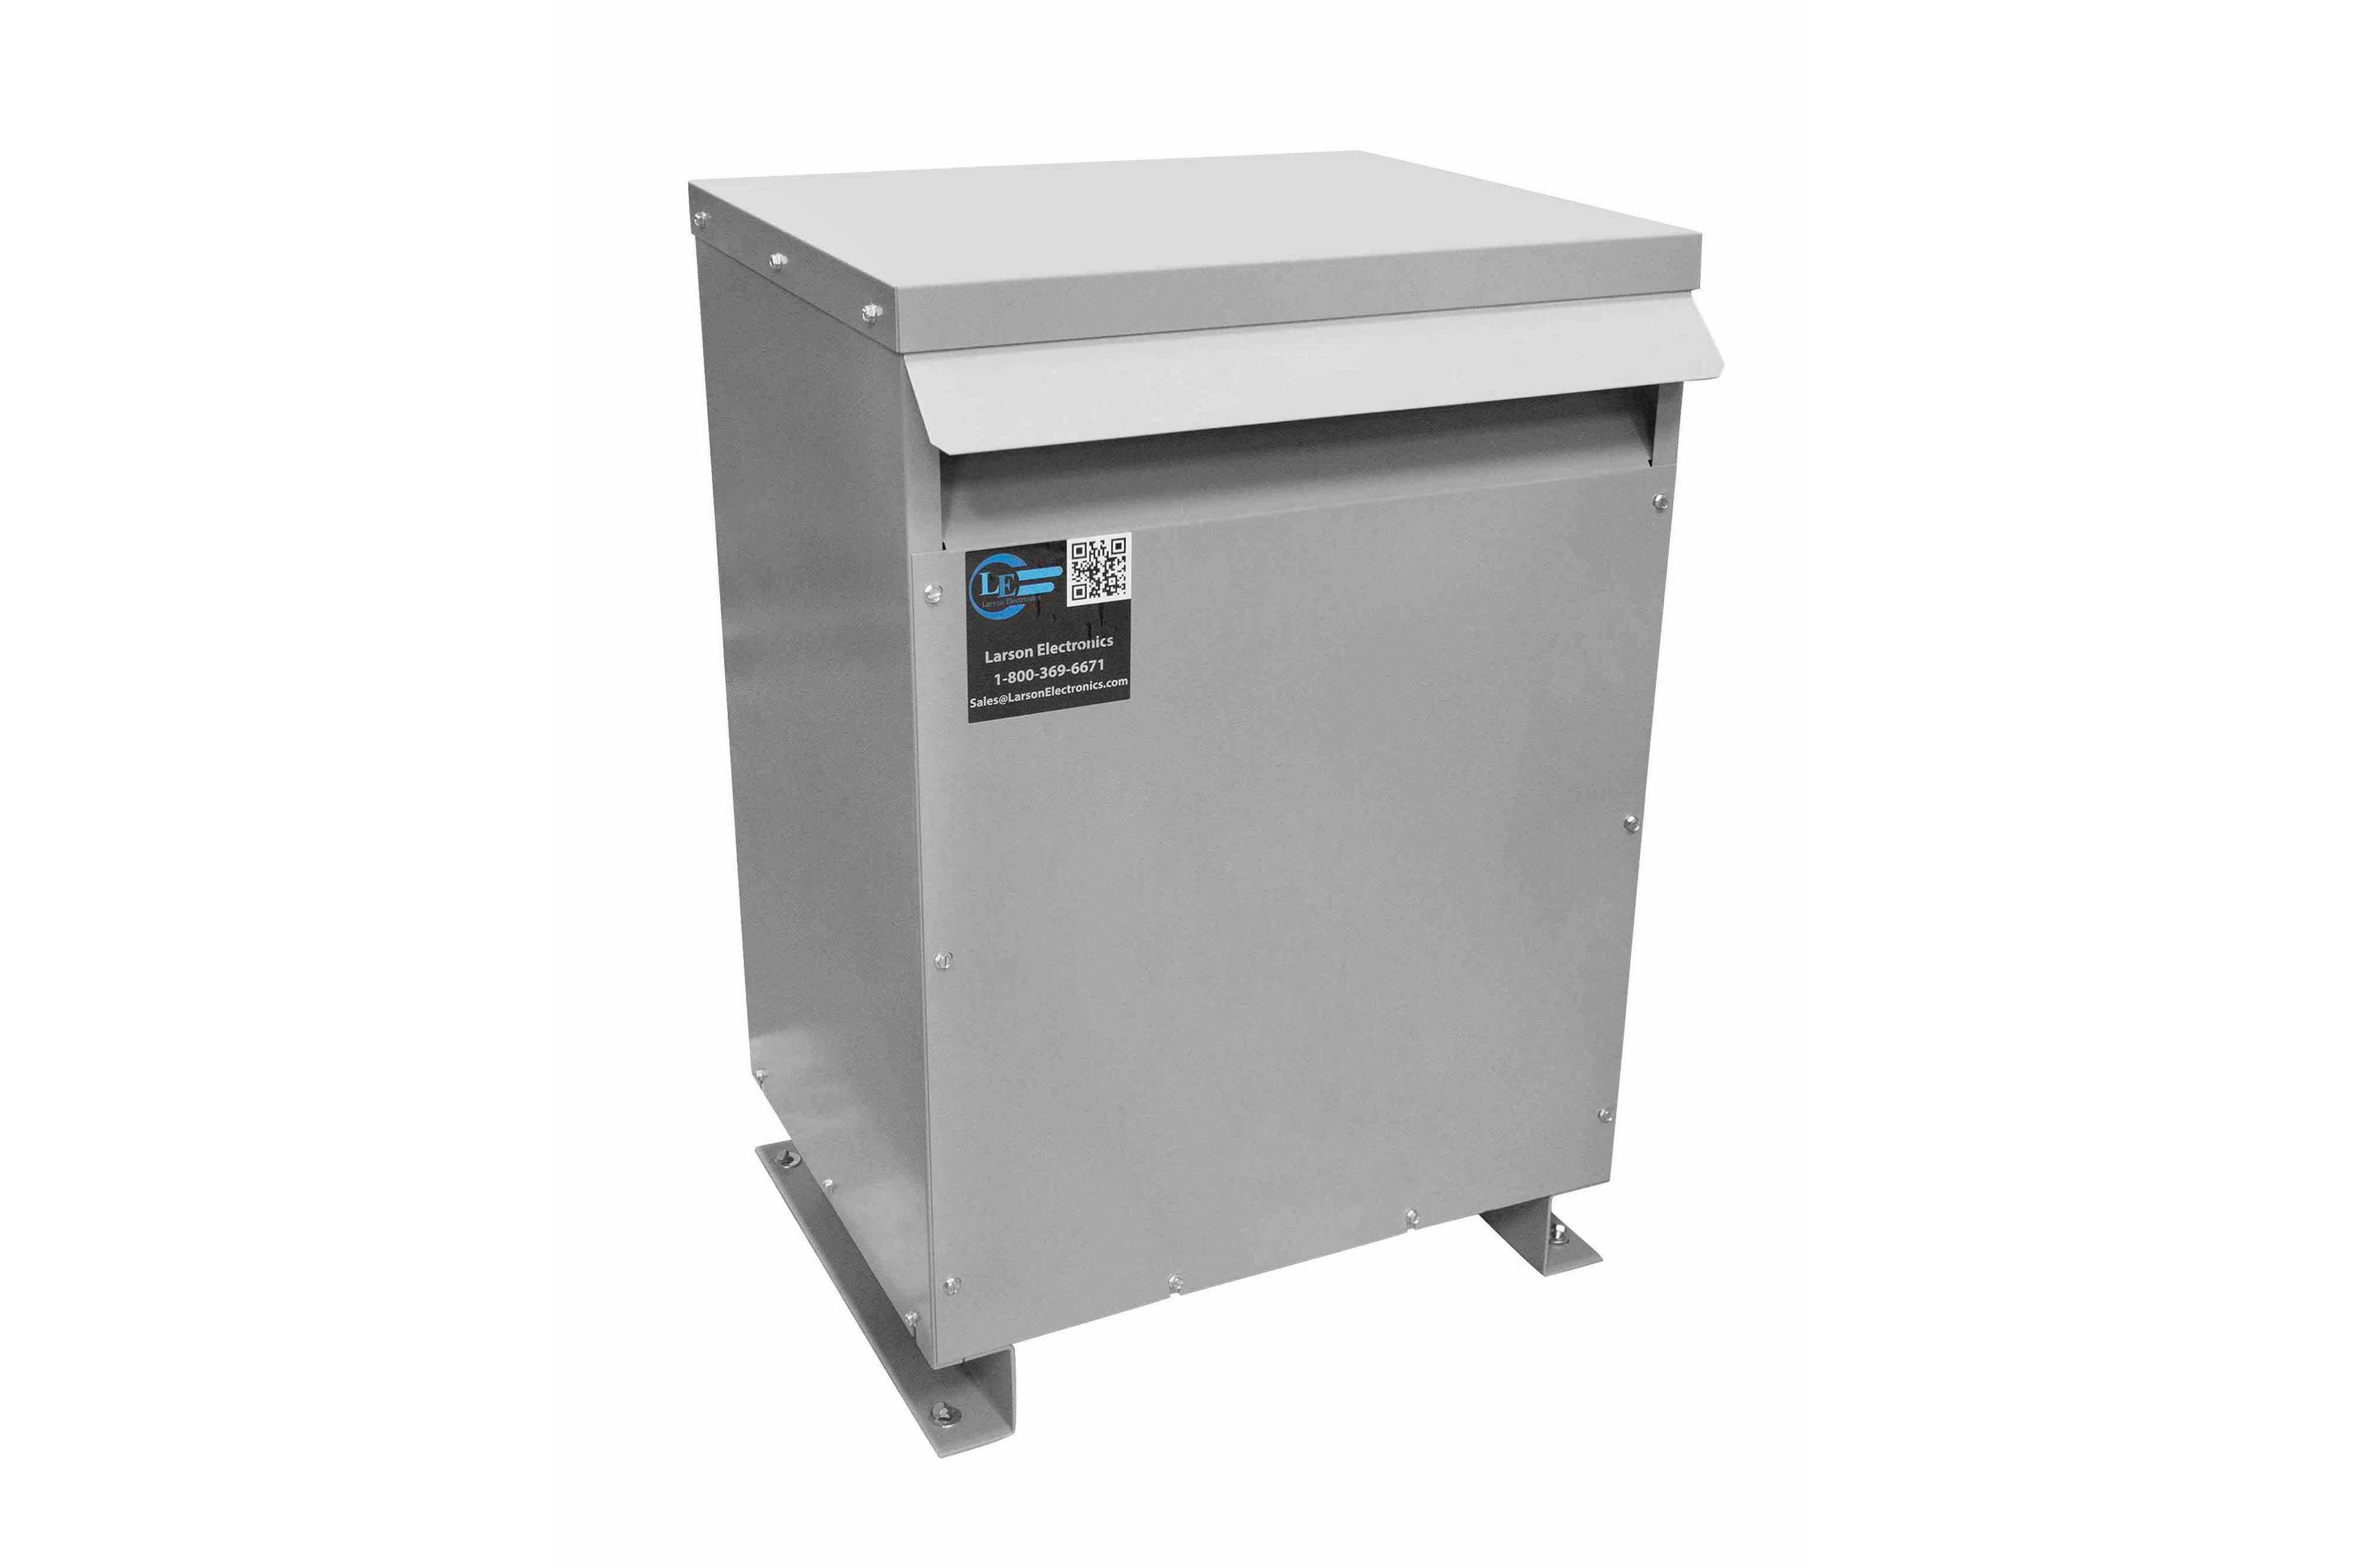 11 kVA 3PH Isolation Transformer, 415V Wye Primary, 240V/120 Delta Secondary, N3R, Ventilated, 60 Hz